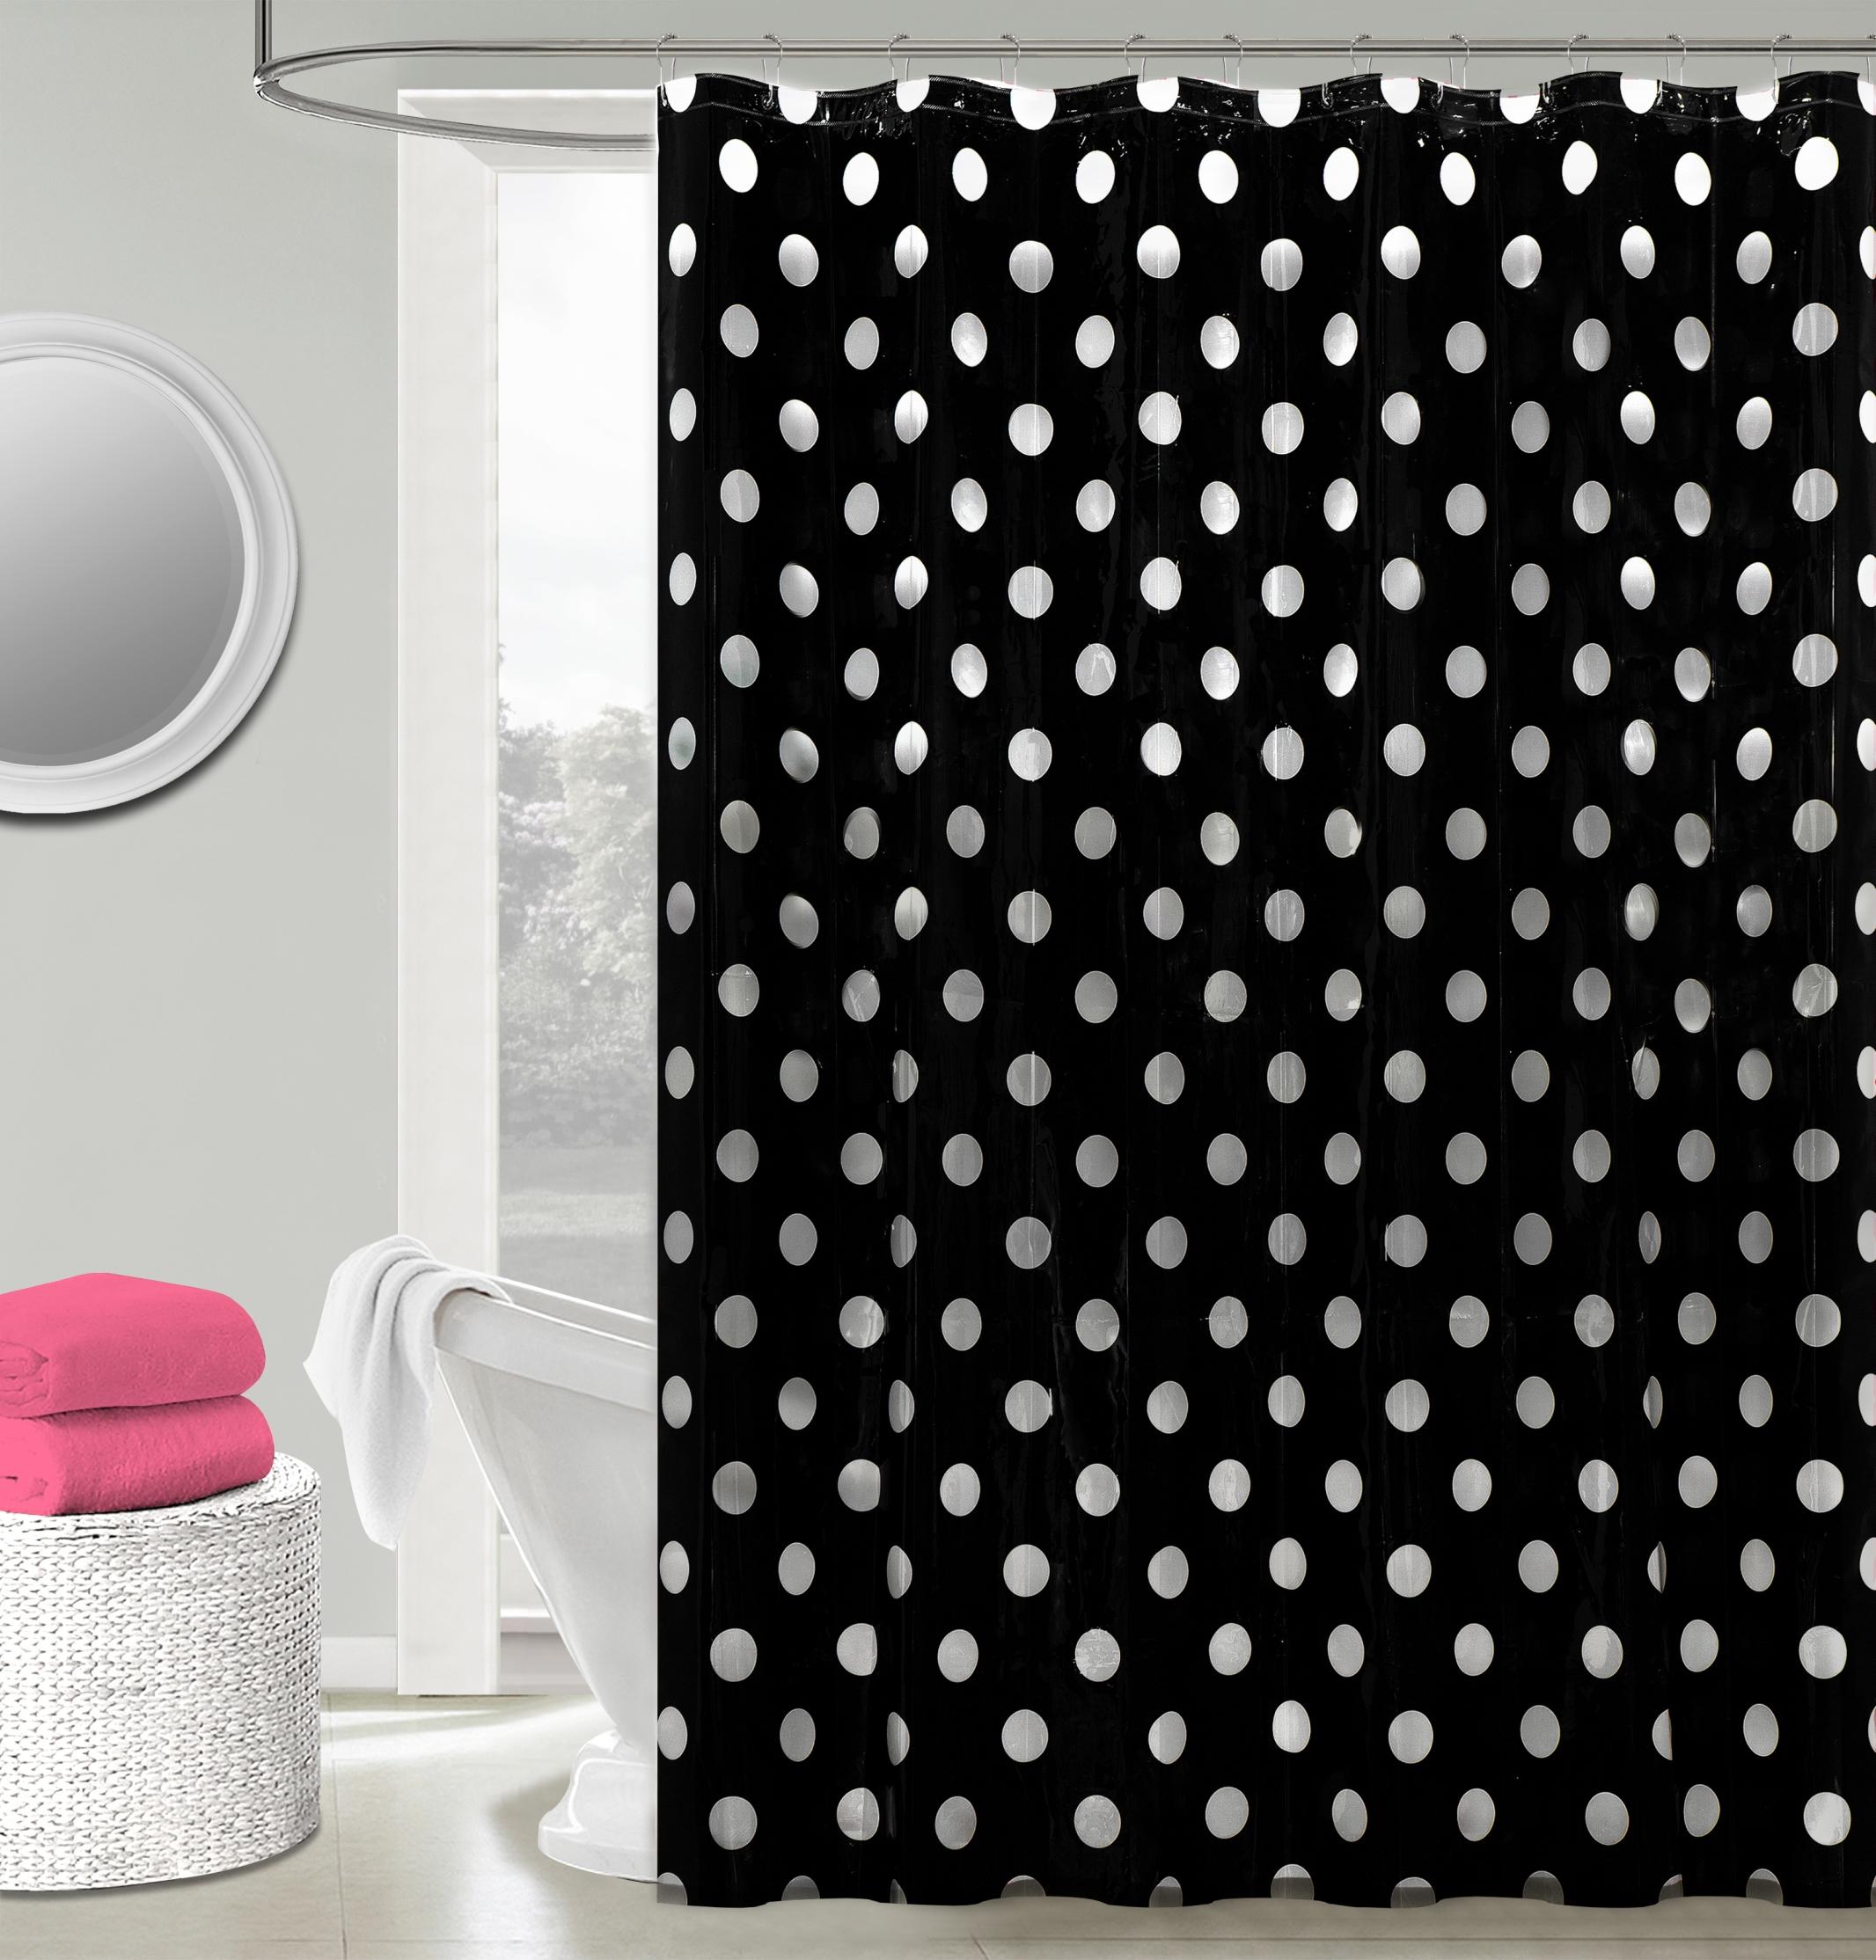 Charmant Peva Polka Dots Shower Curtain Set   Black